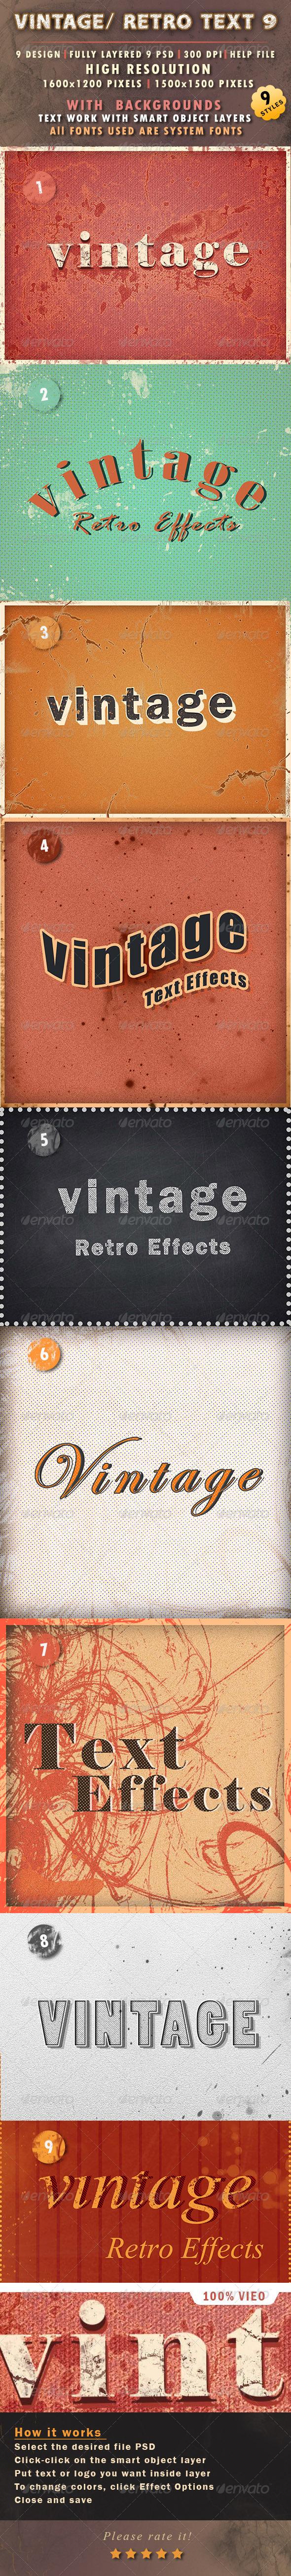 GraphicRiver Vintage Retro Text 9 8294301